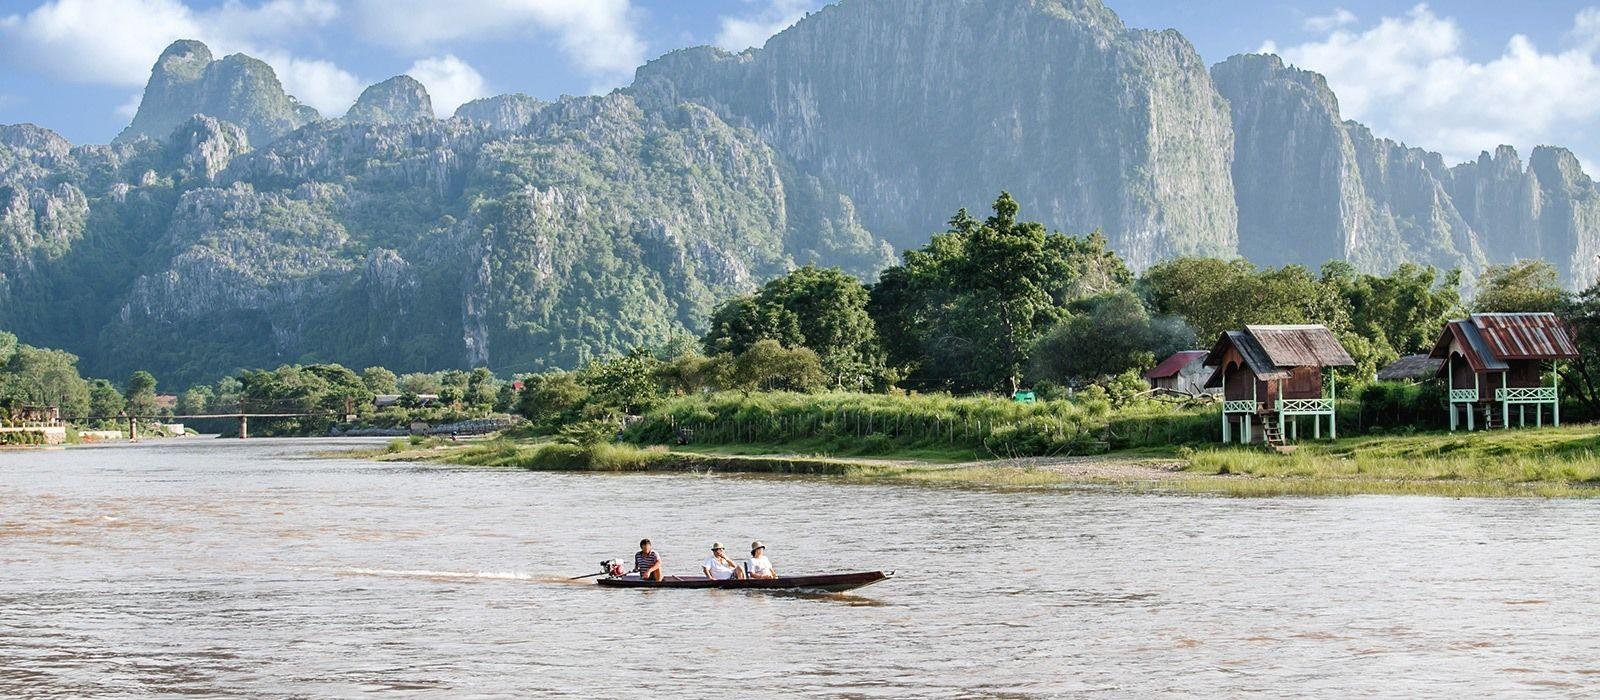 Destination Phonsavan Laos